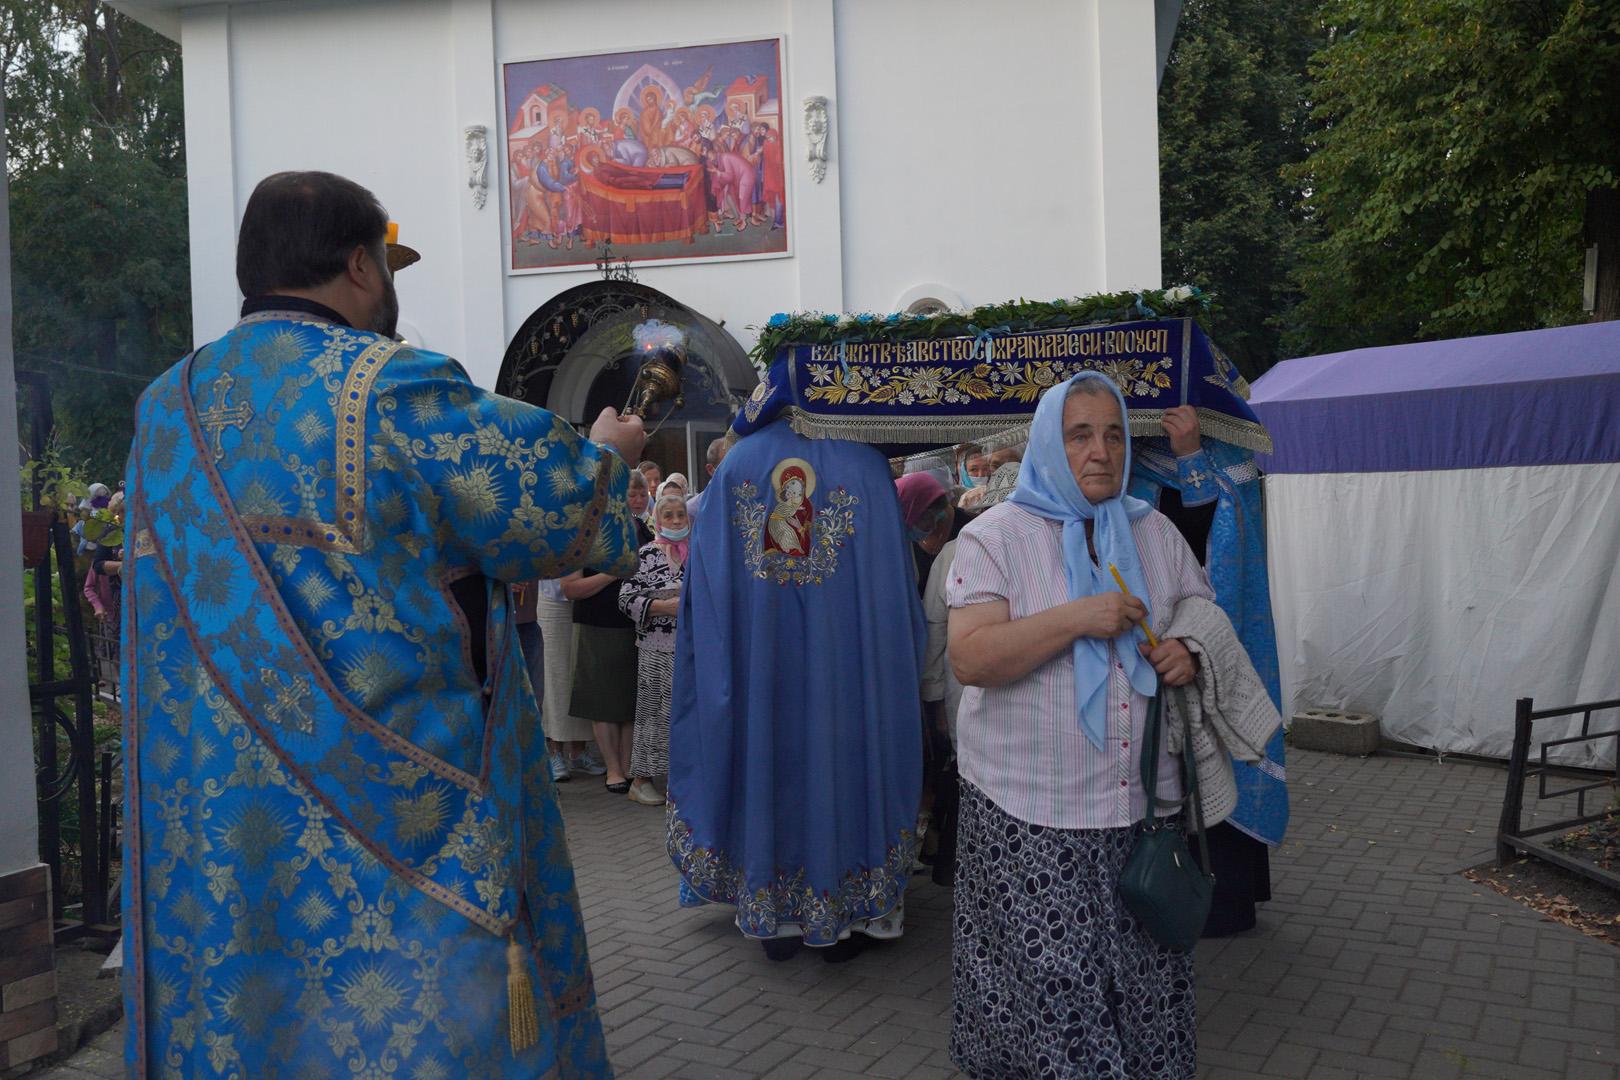 http://monuspen.ru/photoreports/eb9de00e1f5615849ea00b127bfcb99d.jpg